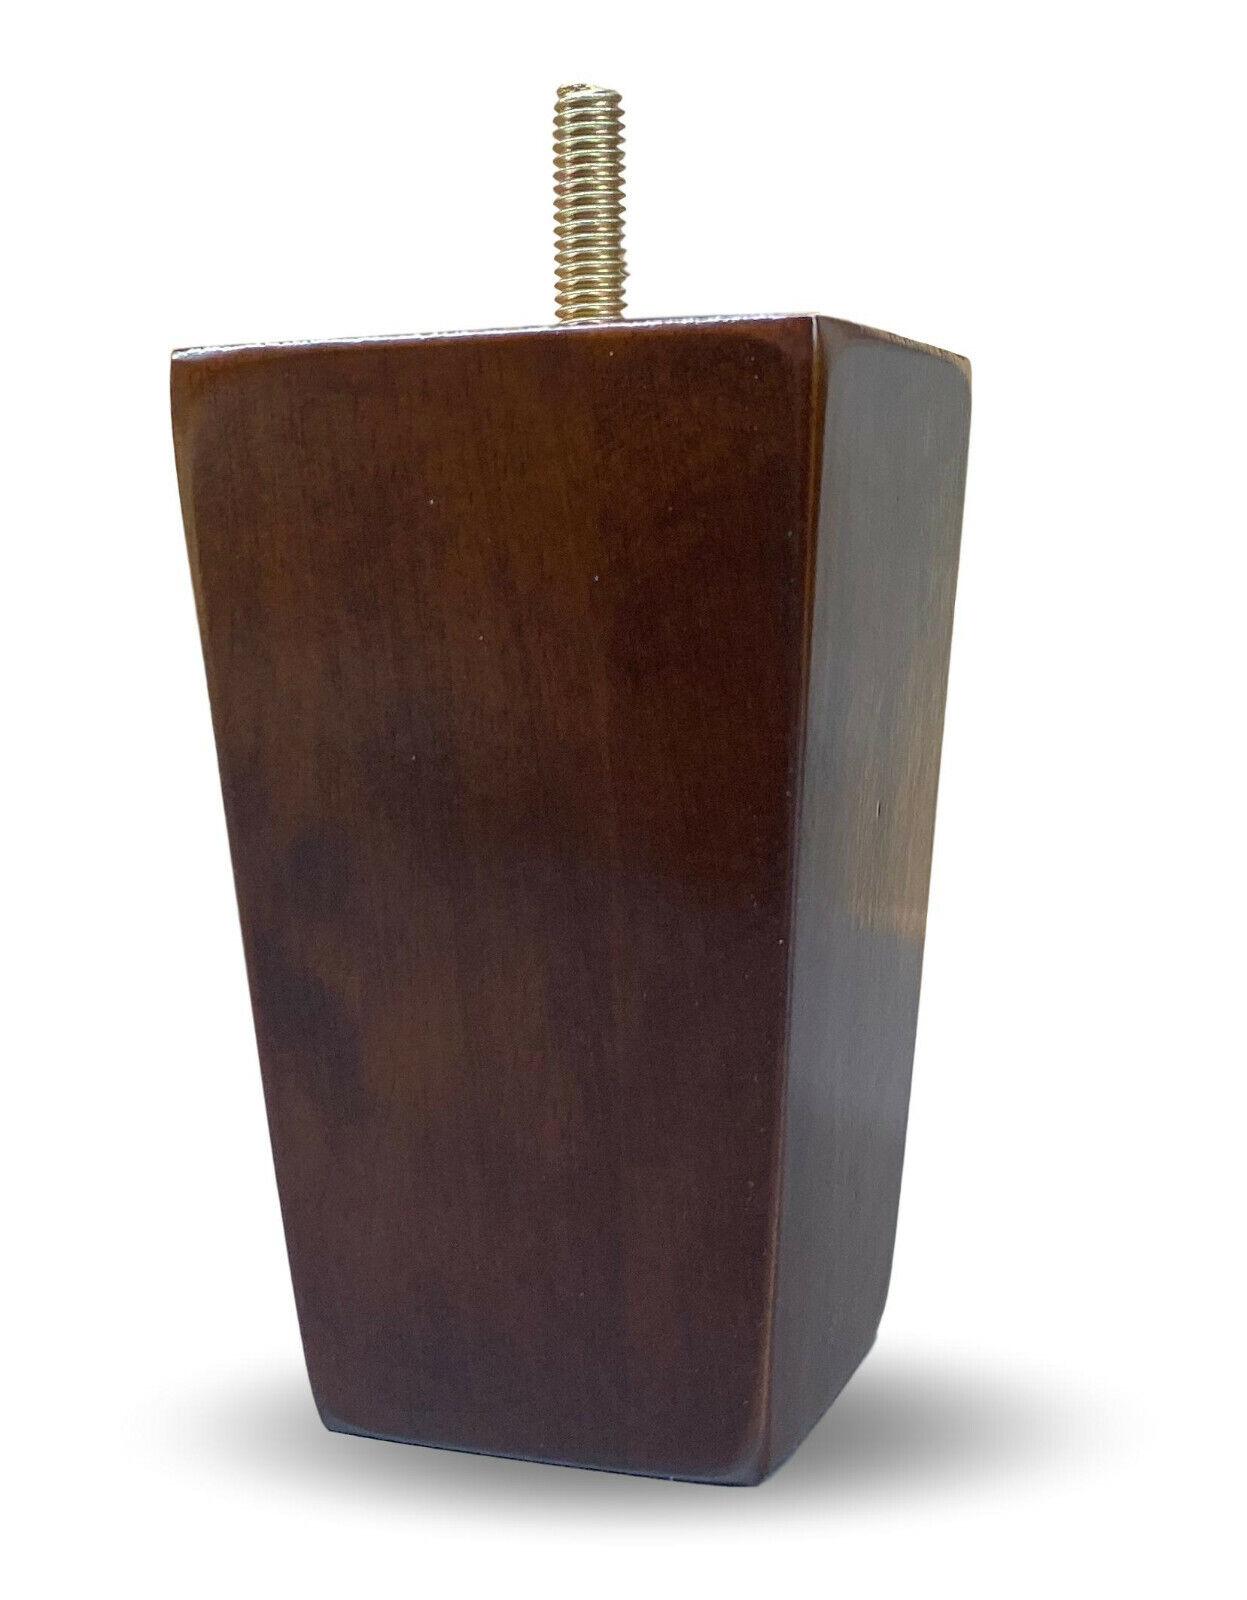 6-3/4″ Brushed Brass Straight Metal Furniture Legs – Set of 4 Furniture